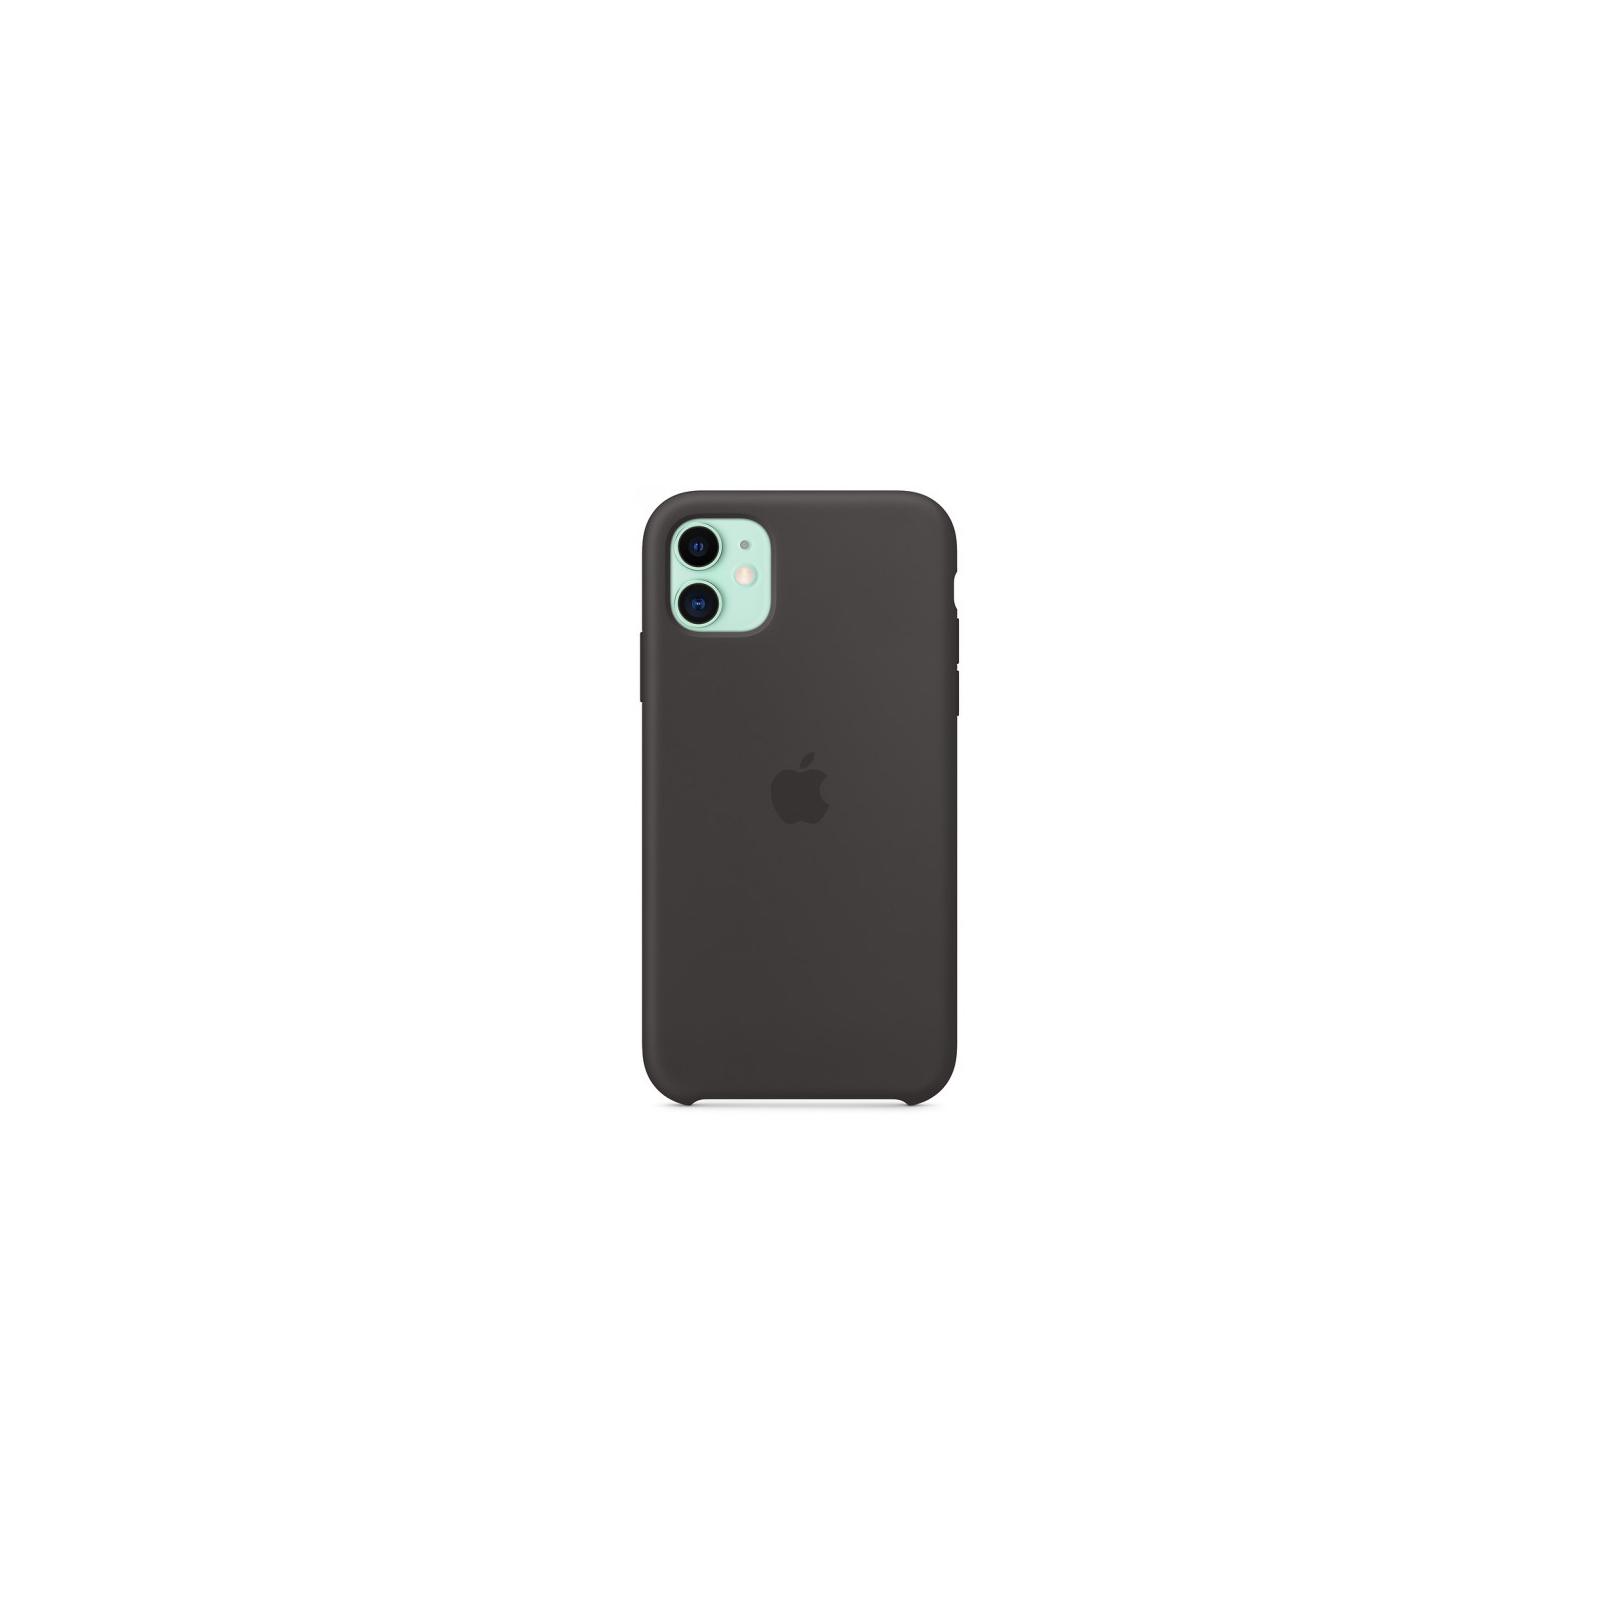 Чехол для моб. телефона Apple iPhone 11 Silicone Case - Black (MWVU2ZM/A) изображение 3